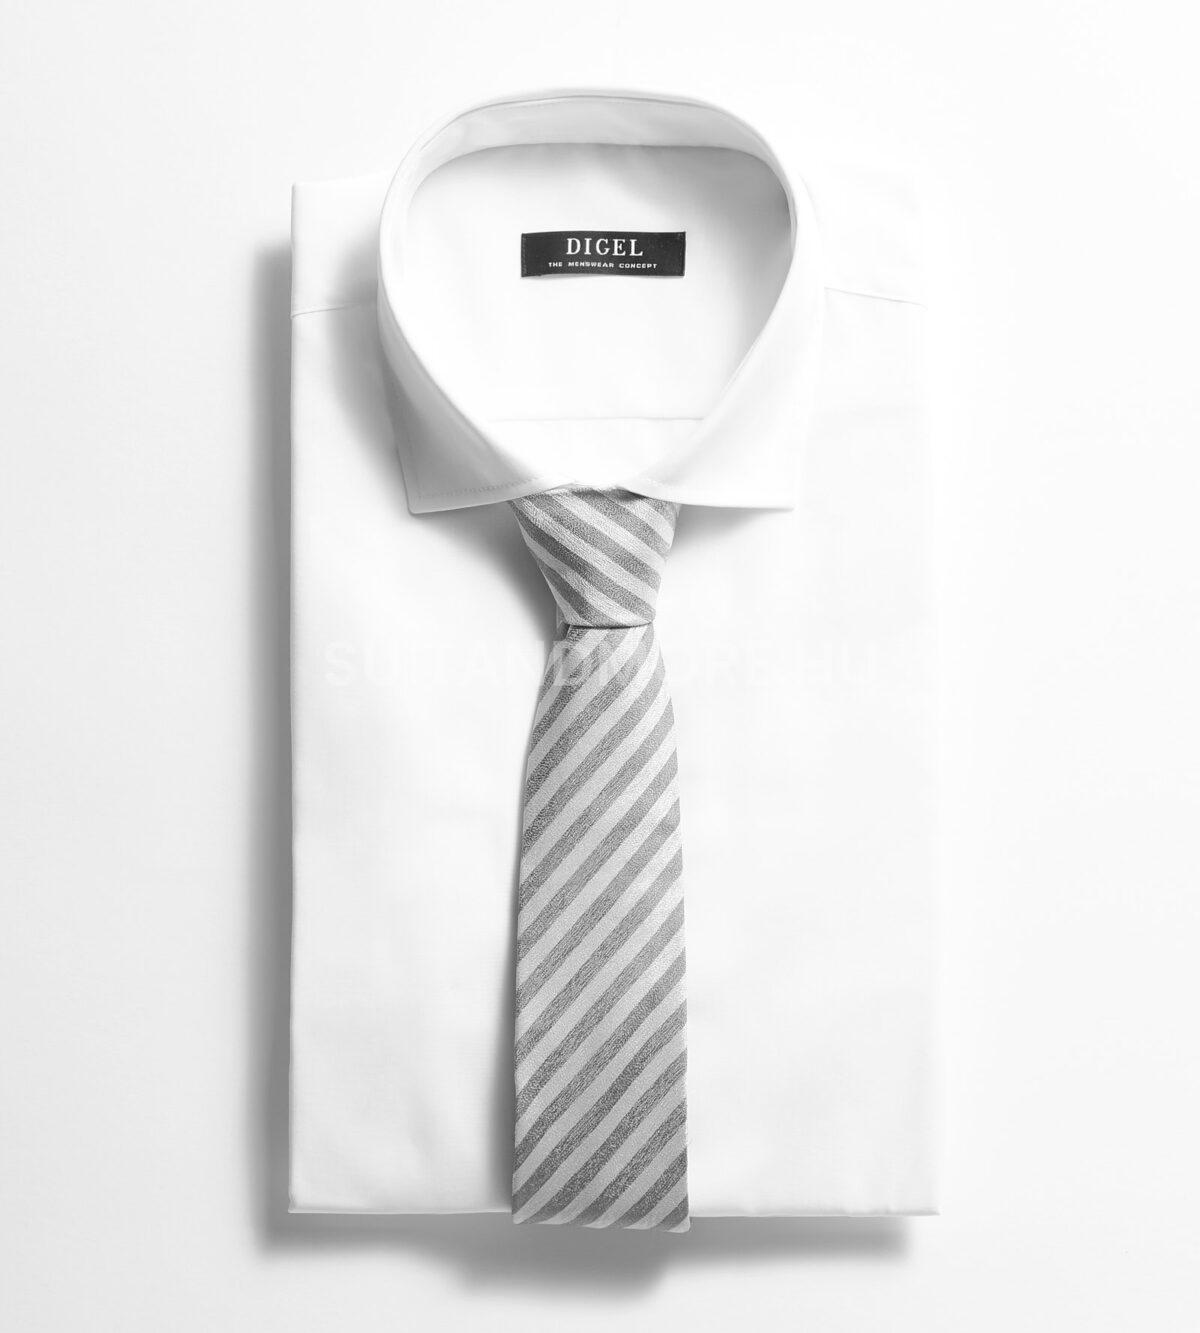 digel-vilagosszurke-csikos-selyem-nyakkendo-dunhill-1179004-45-02